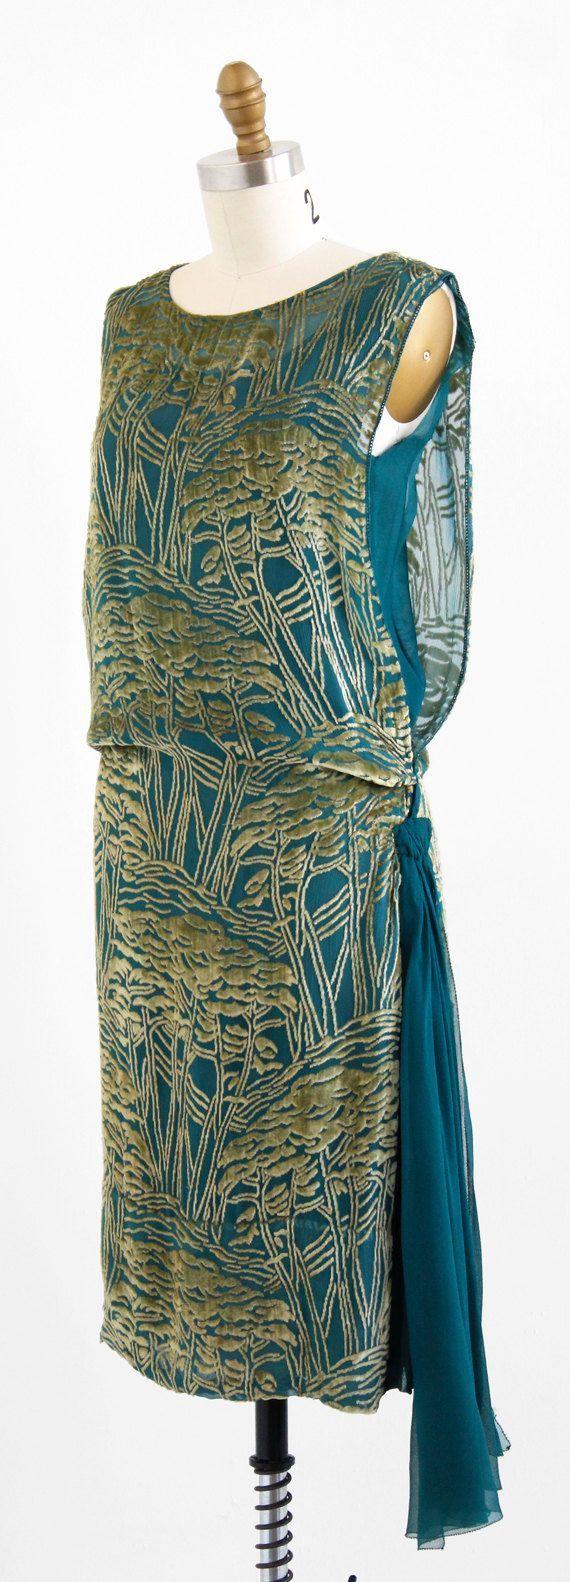 Teal silk and silver velvet tabard dress, 1920's